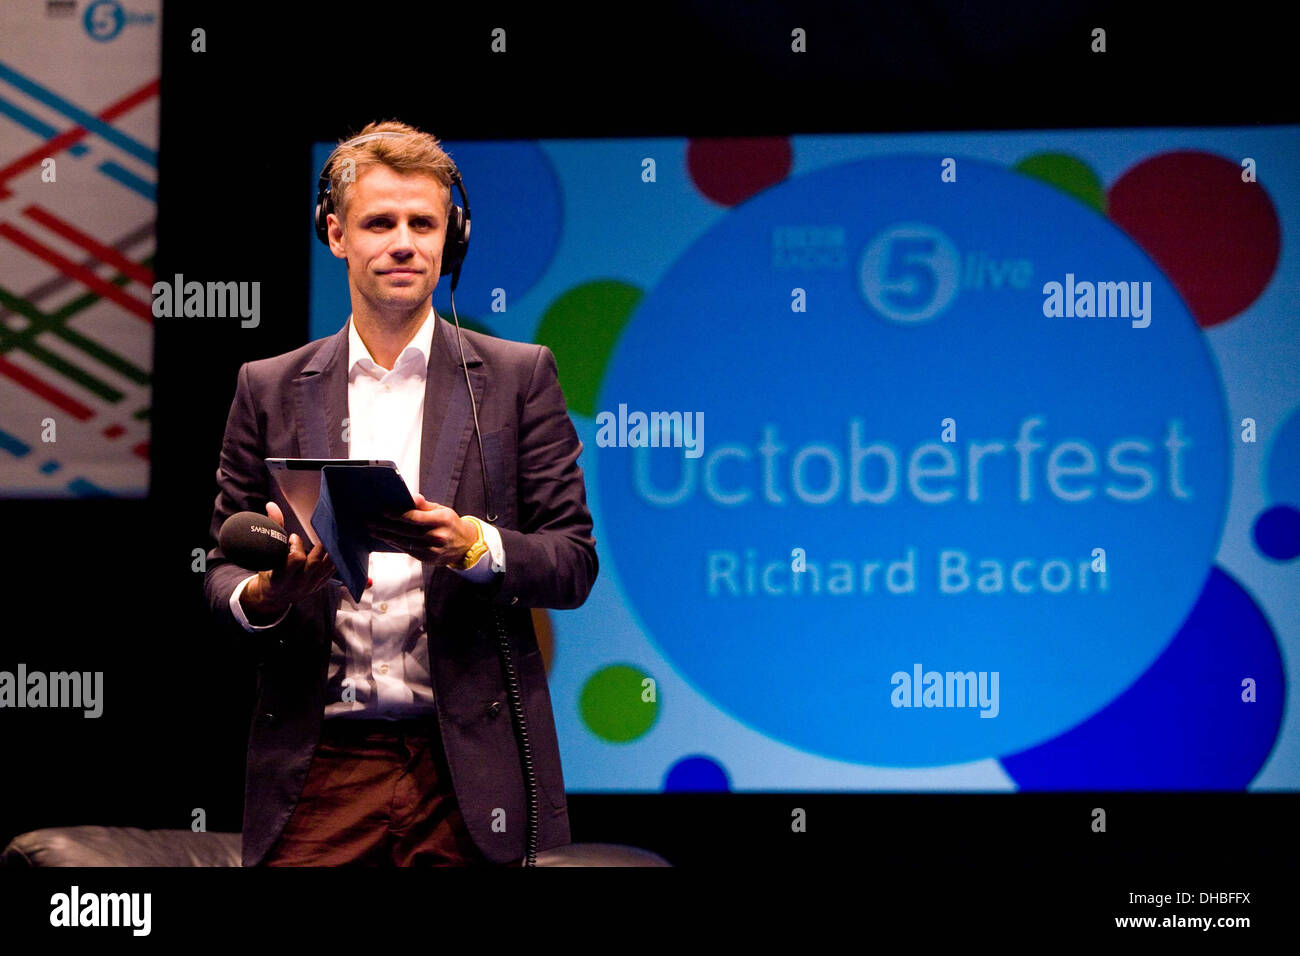 Richard Bacon at BBC Radio 5 Live Octoberfest in Sheffield Thursday 11/10/12 Stock Photo